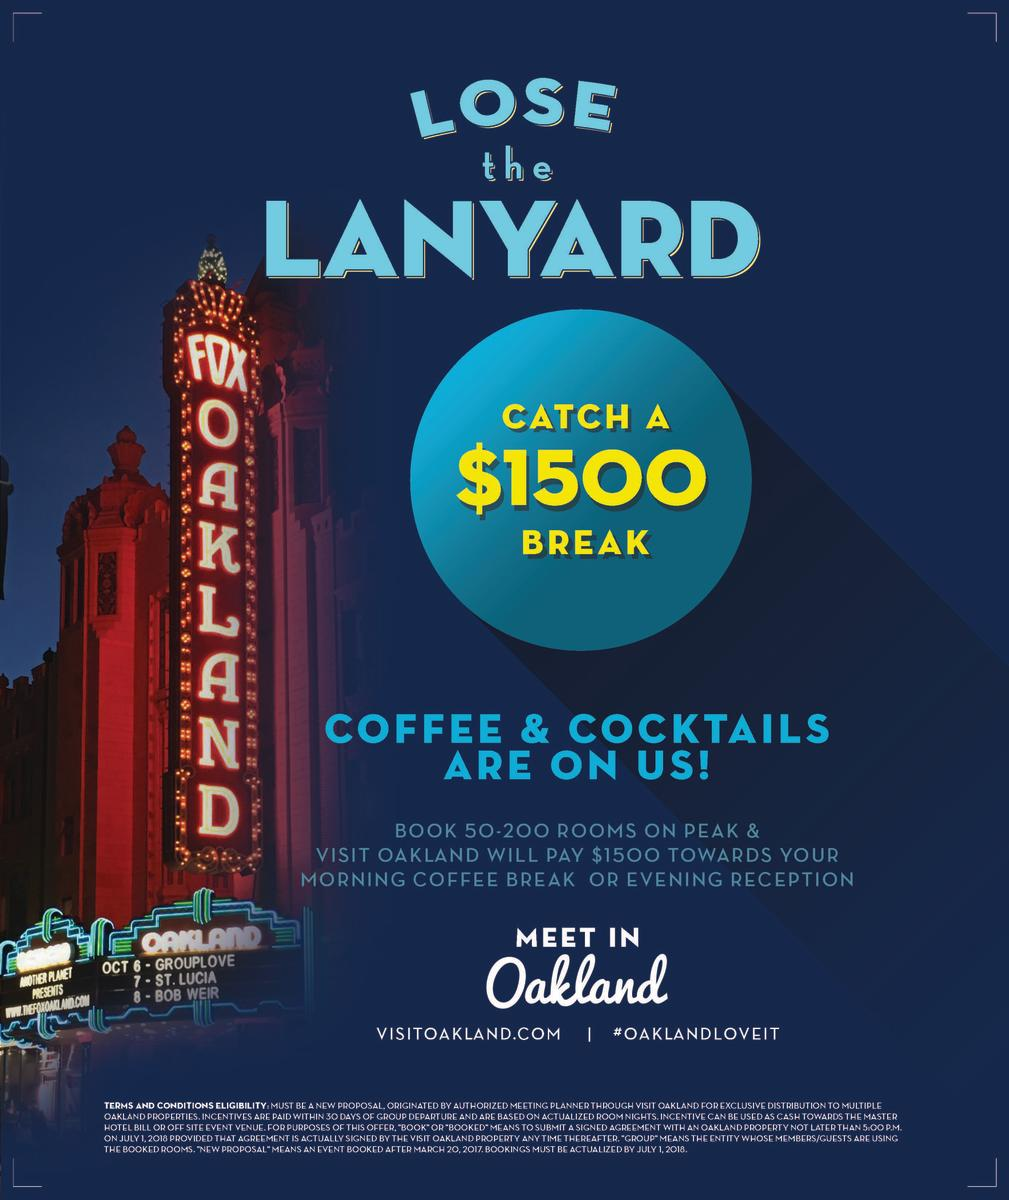 Visit Oakland Meeting Incentive